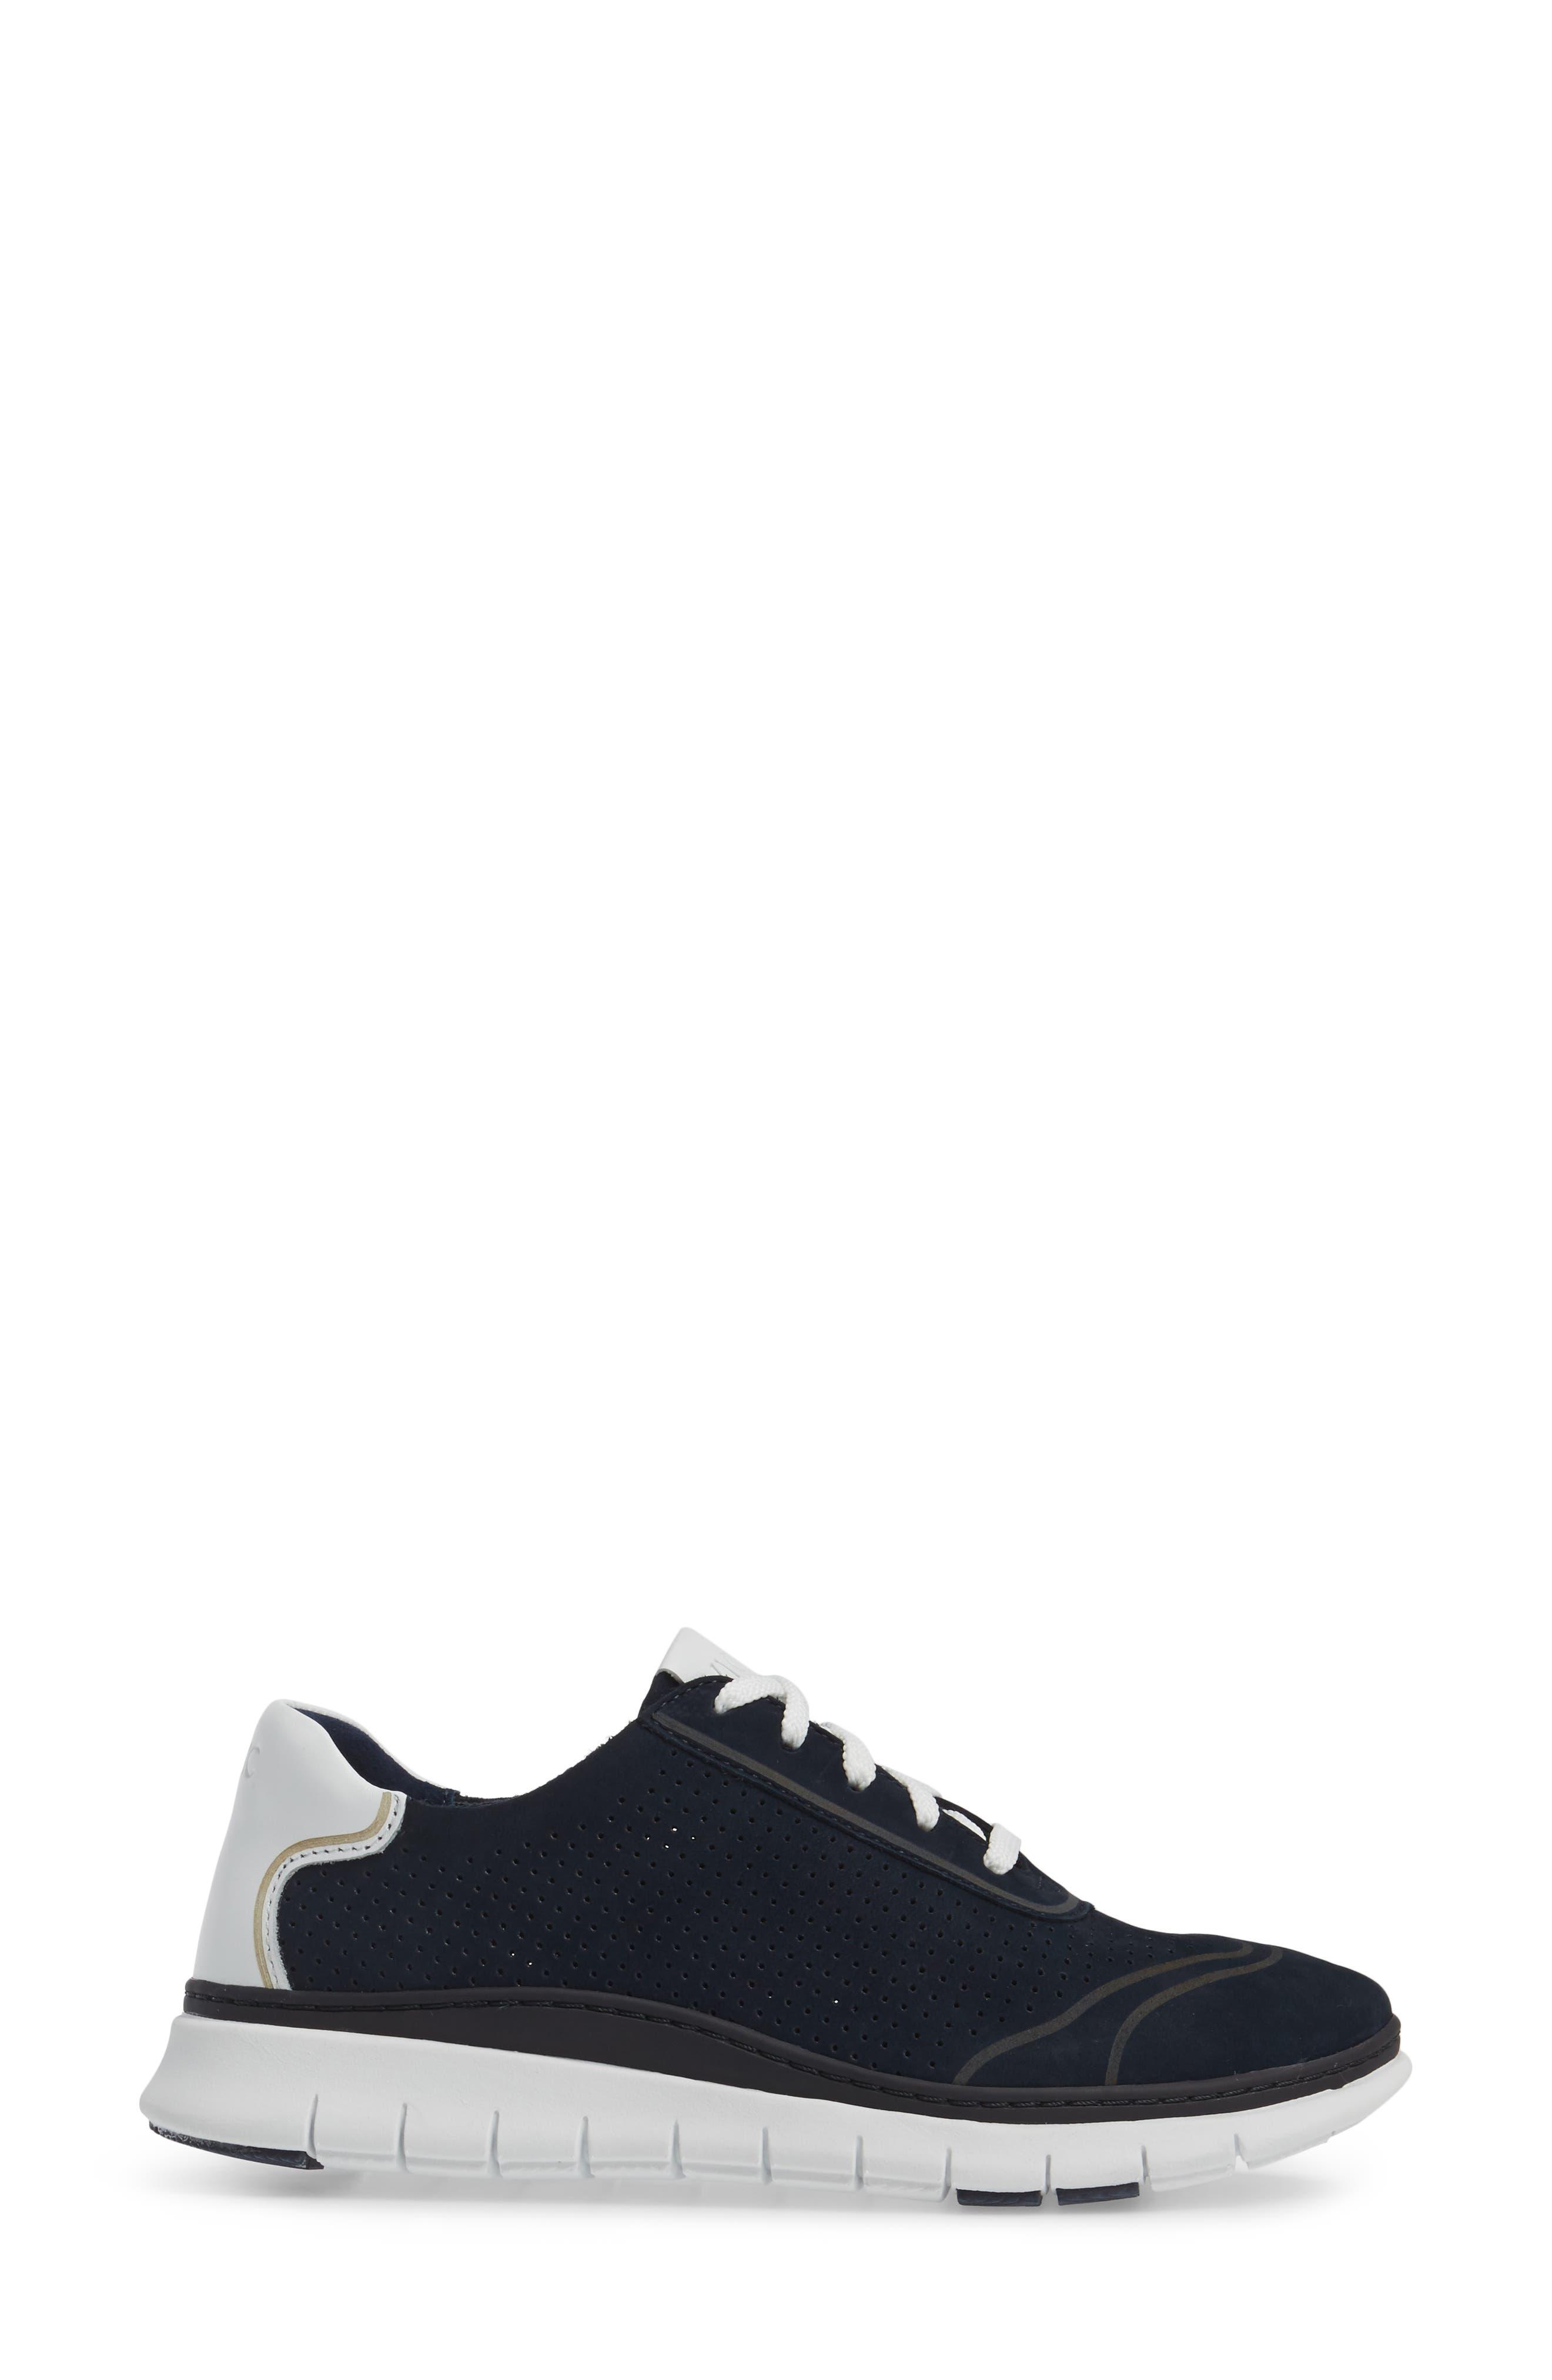 Alternate Image 3  - Vionic Fresh Riley Perforated Sneaker (Women)